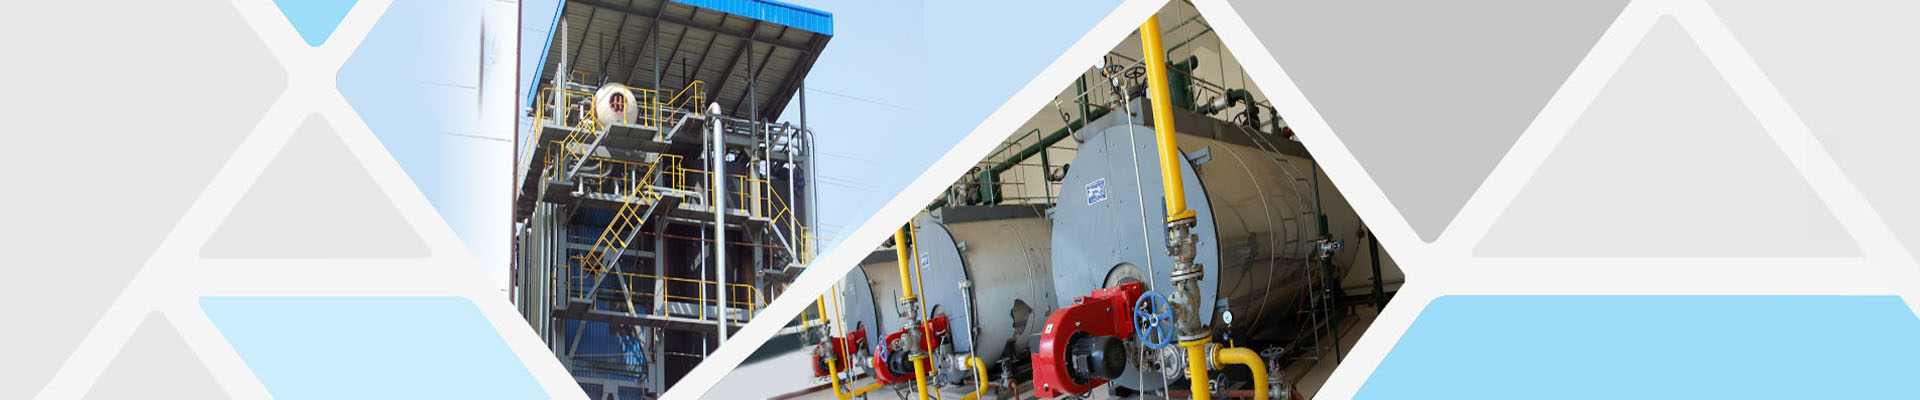 China Industrial Boiler Manufacturer Supplier Factory Exporter